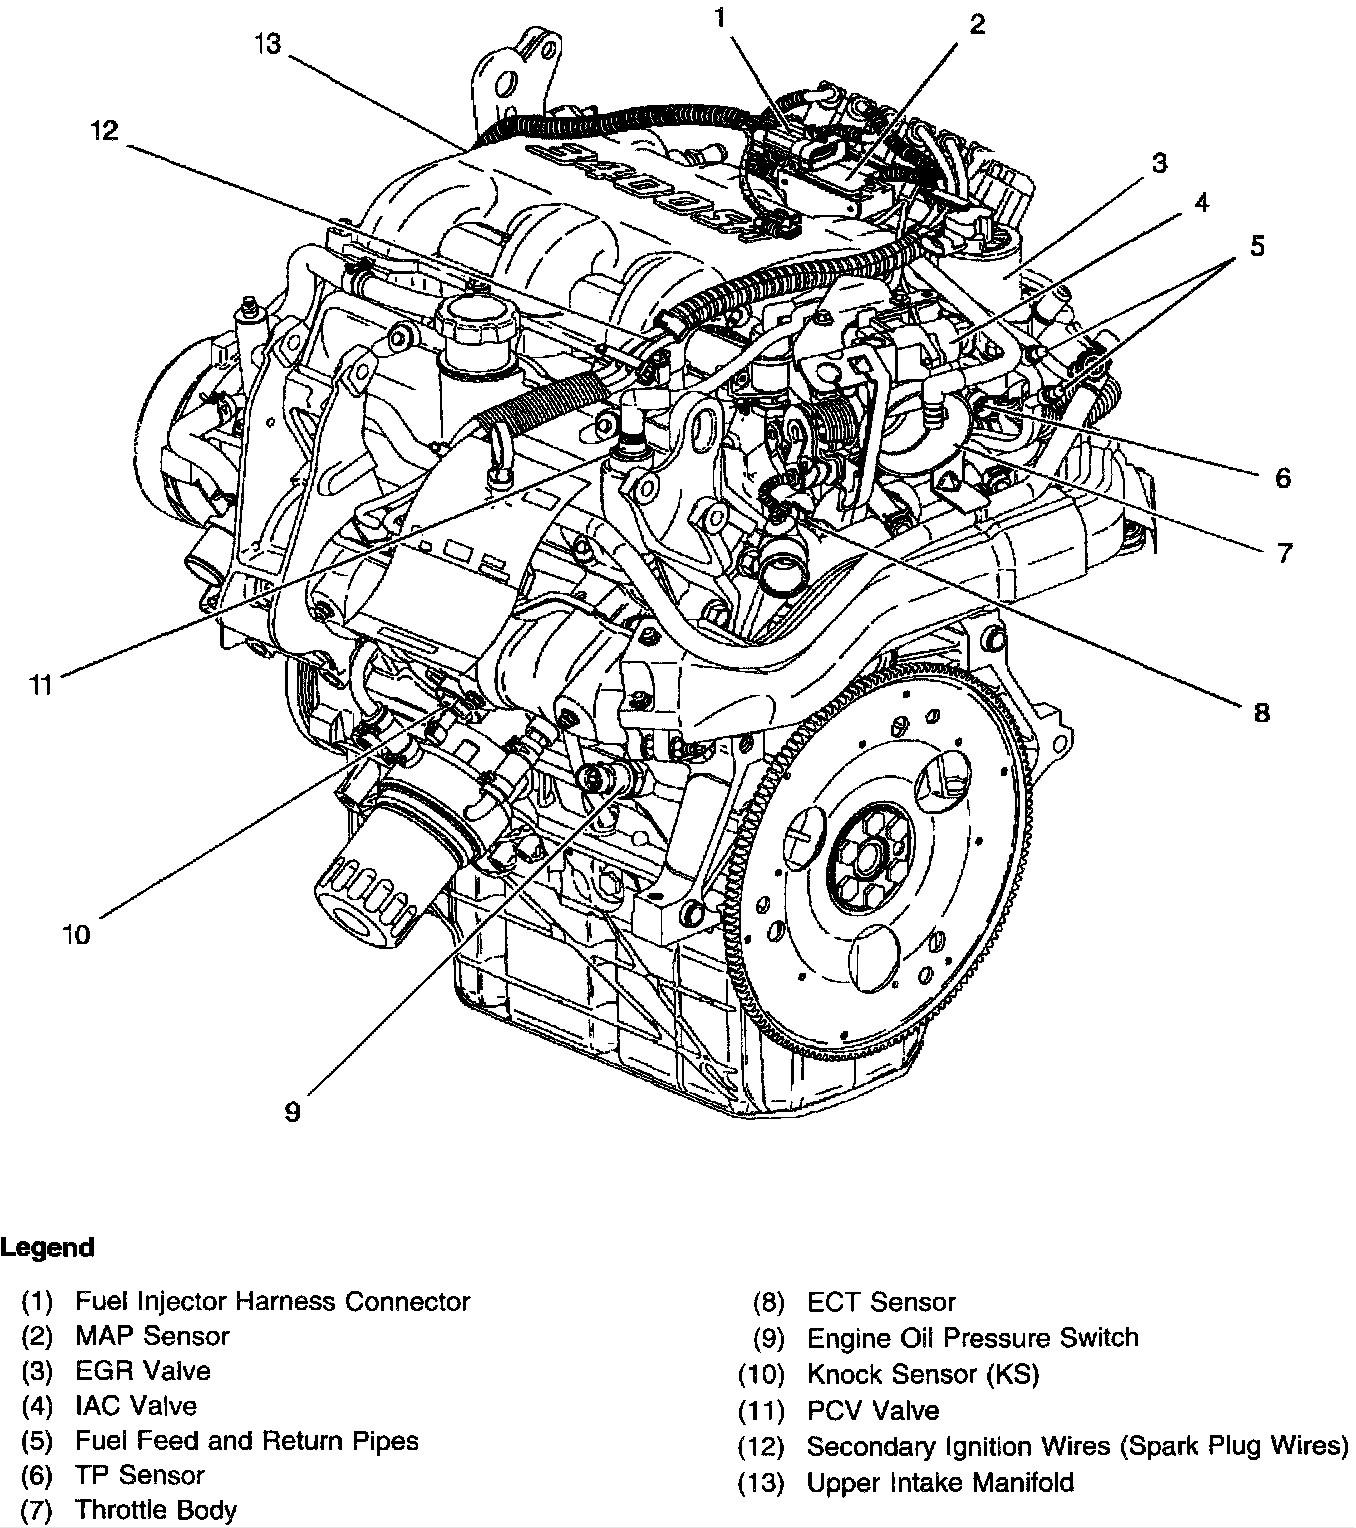 Maxxforce 13 Engine Sensor Harness Diagram Diagram] Mazda V6 Engine Diagram Full Version Hd Quality Of Maxxforce 13 Engine Sensor Harness Diagram